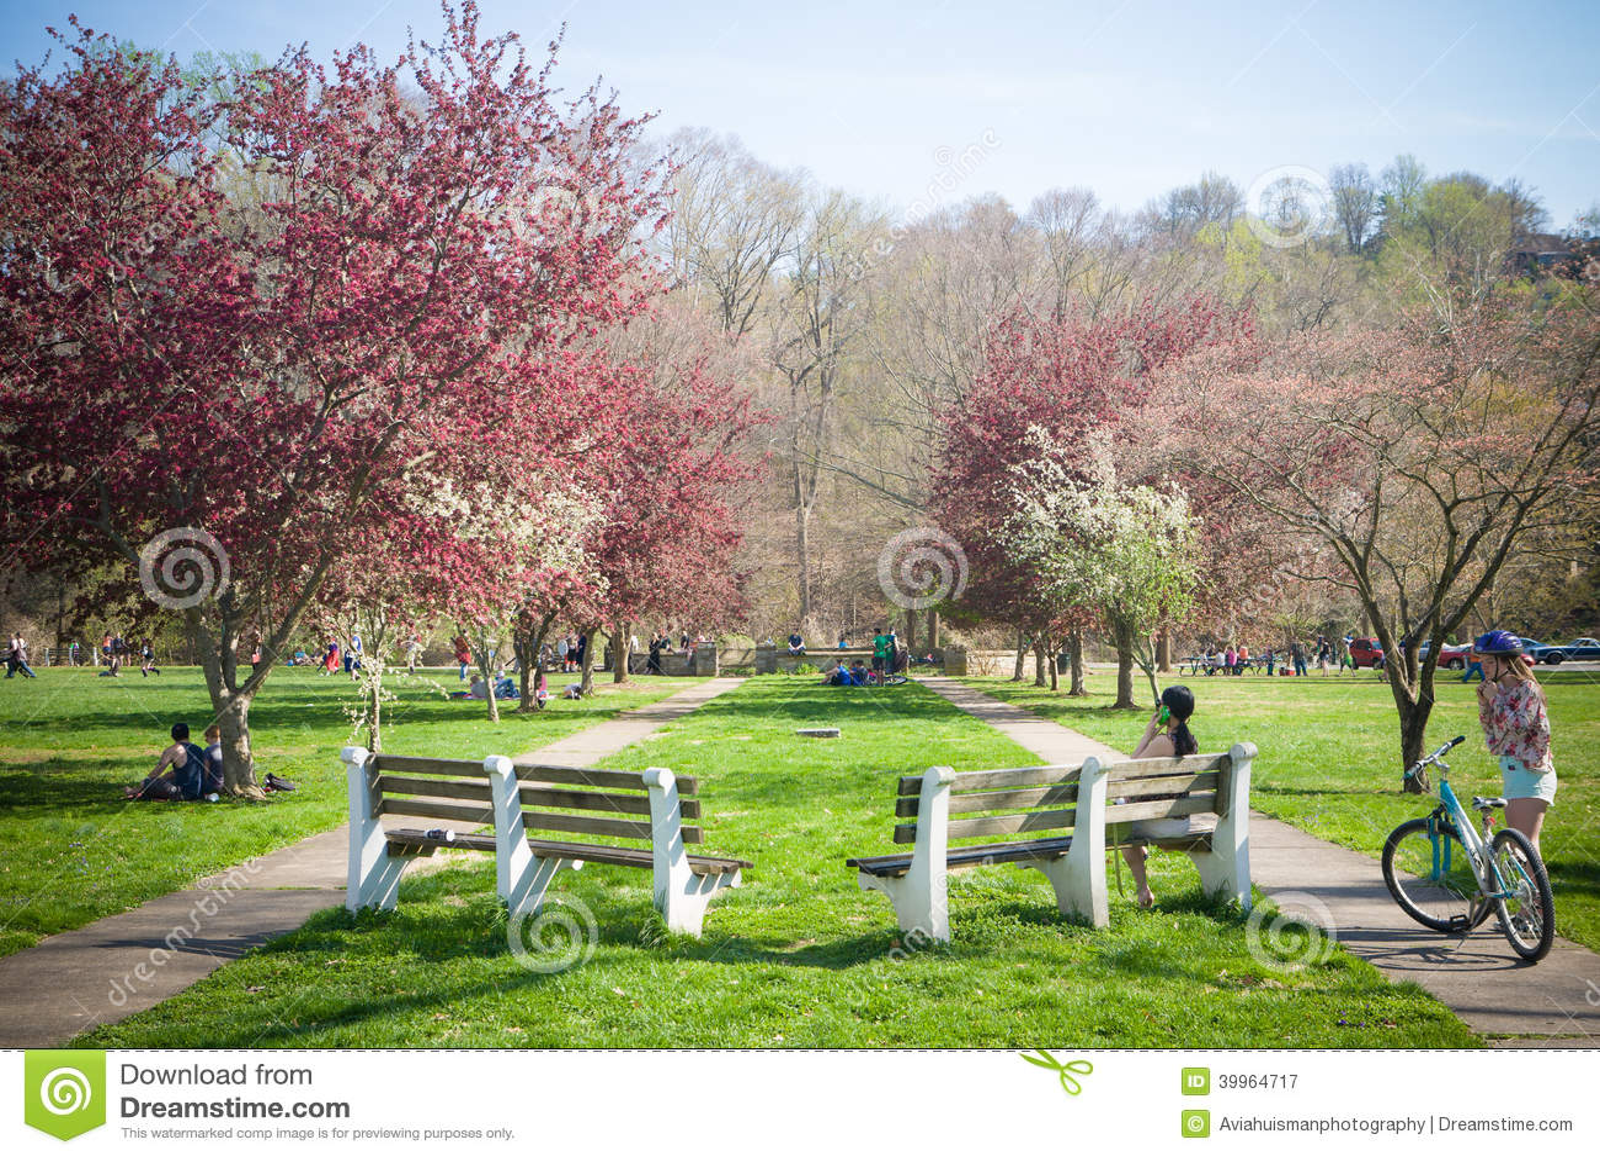 Enjoying Spring Activities At The Park Editorial